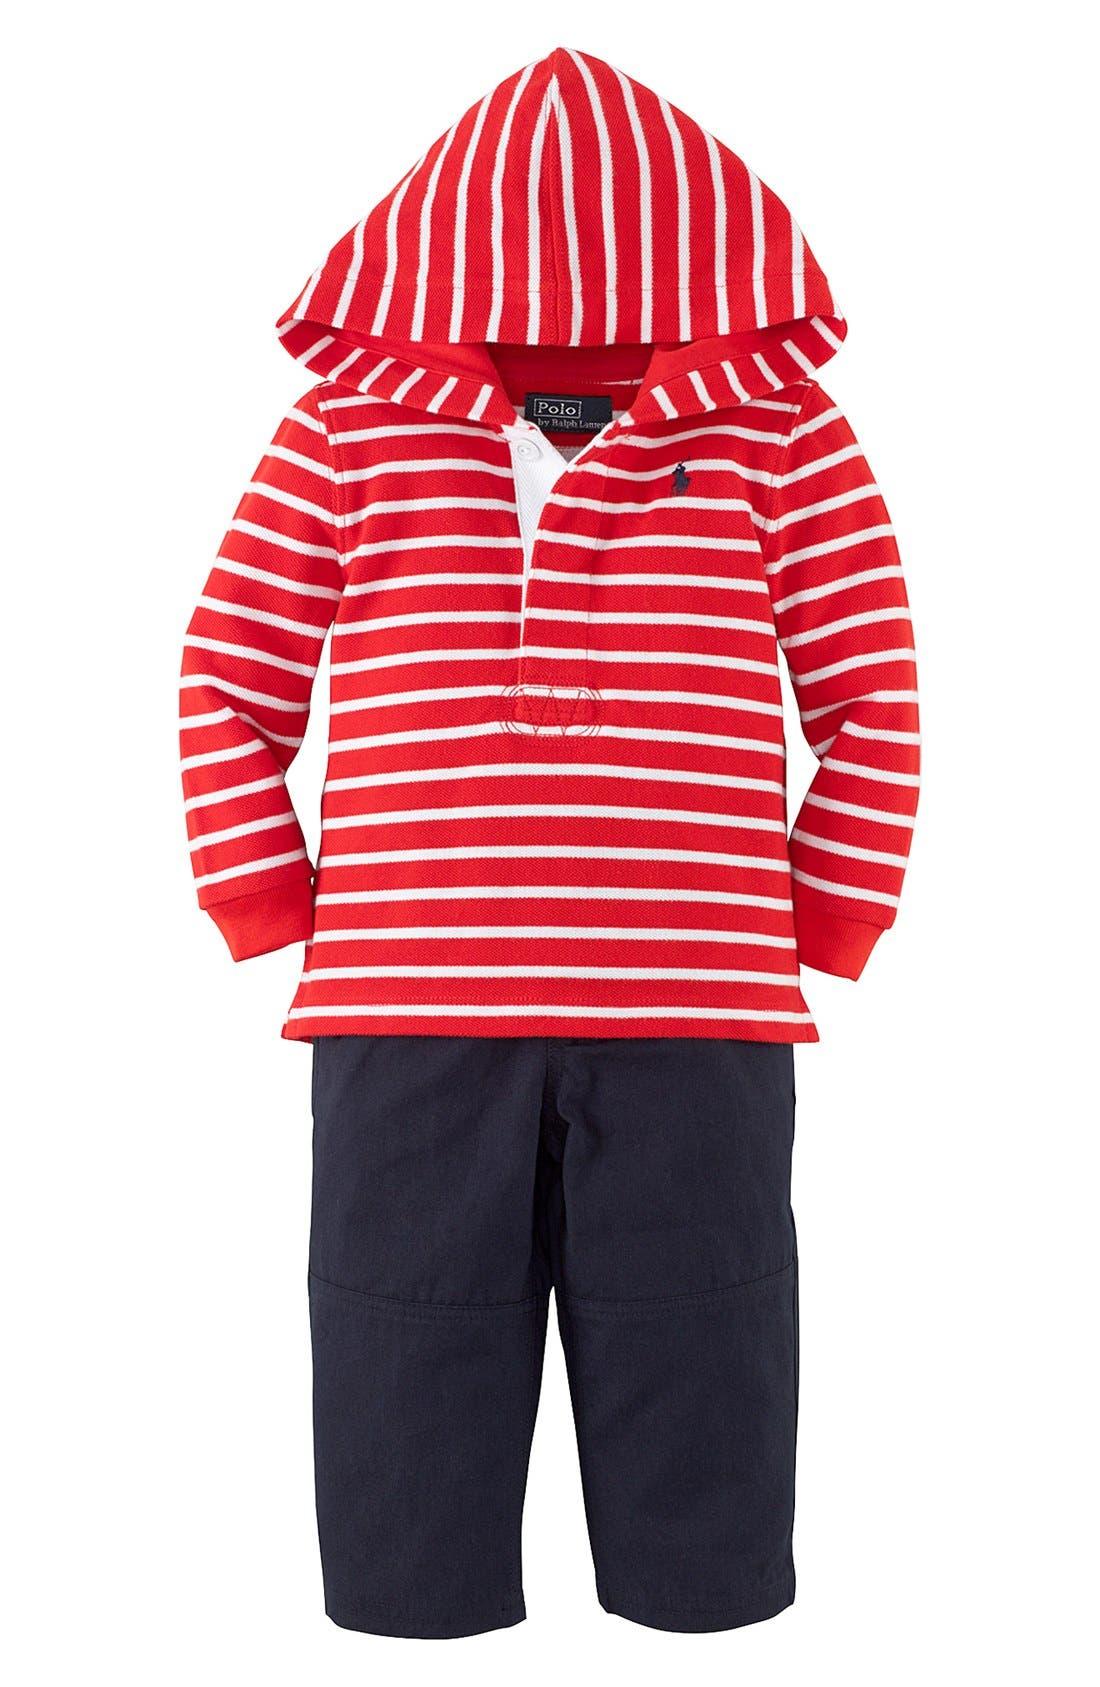 Alternate Image 1 Selected - Ralph Lauren Hooded T-Shirt & Woven Pants (Baby Boys)